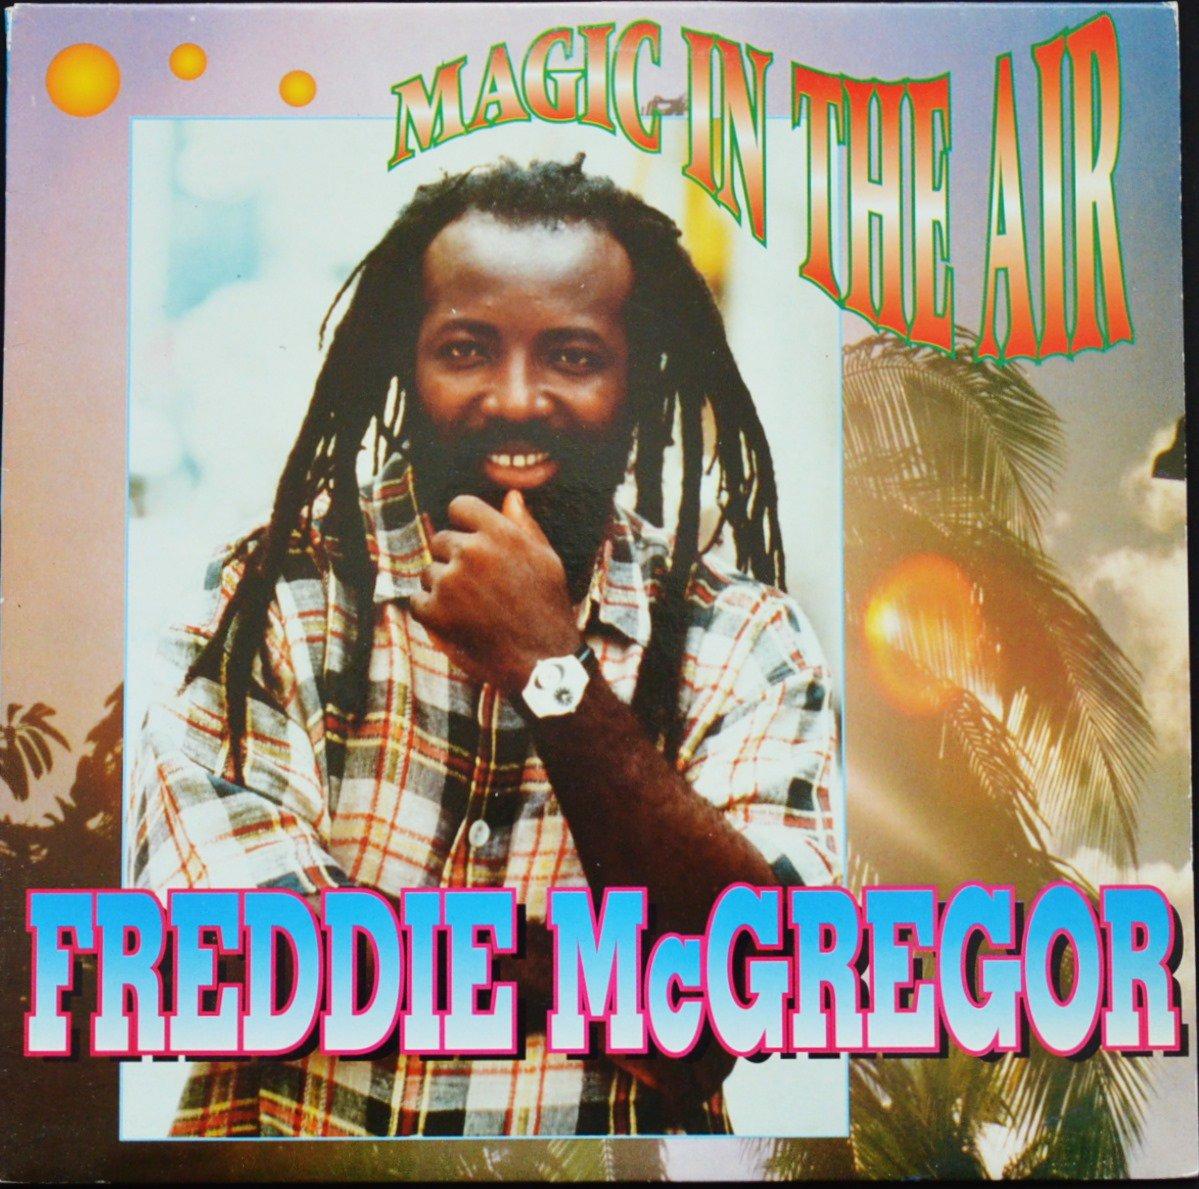 FREDDIE MCGREGOR / MAGIC IN THE AIR (1LP)